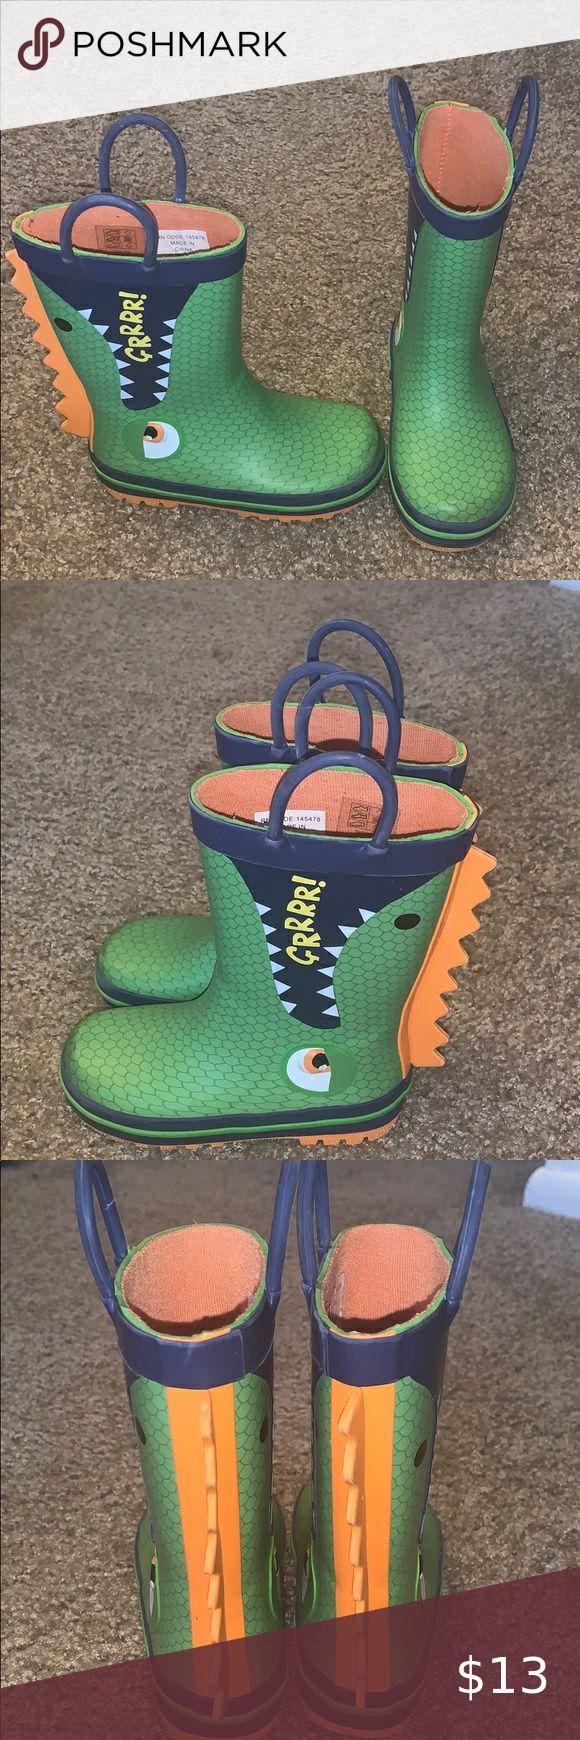 Toddler boy dinosaur rain boot in 2020 | Toddler rain ...